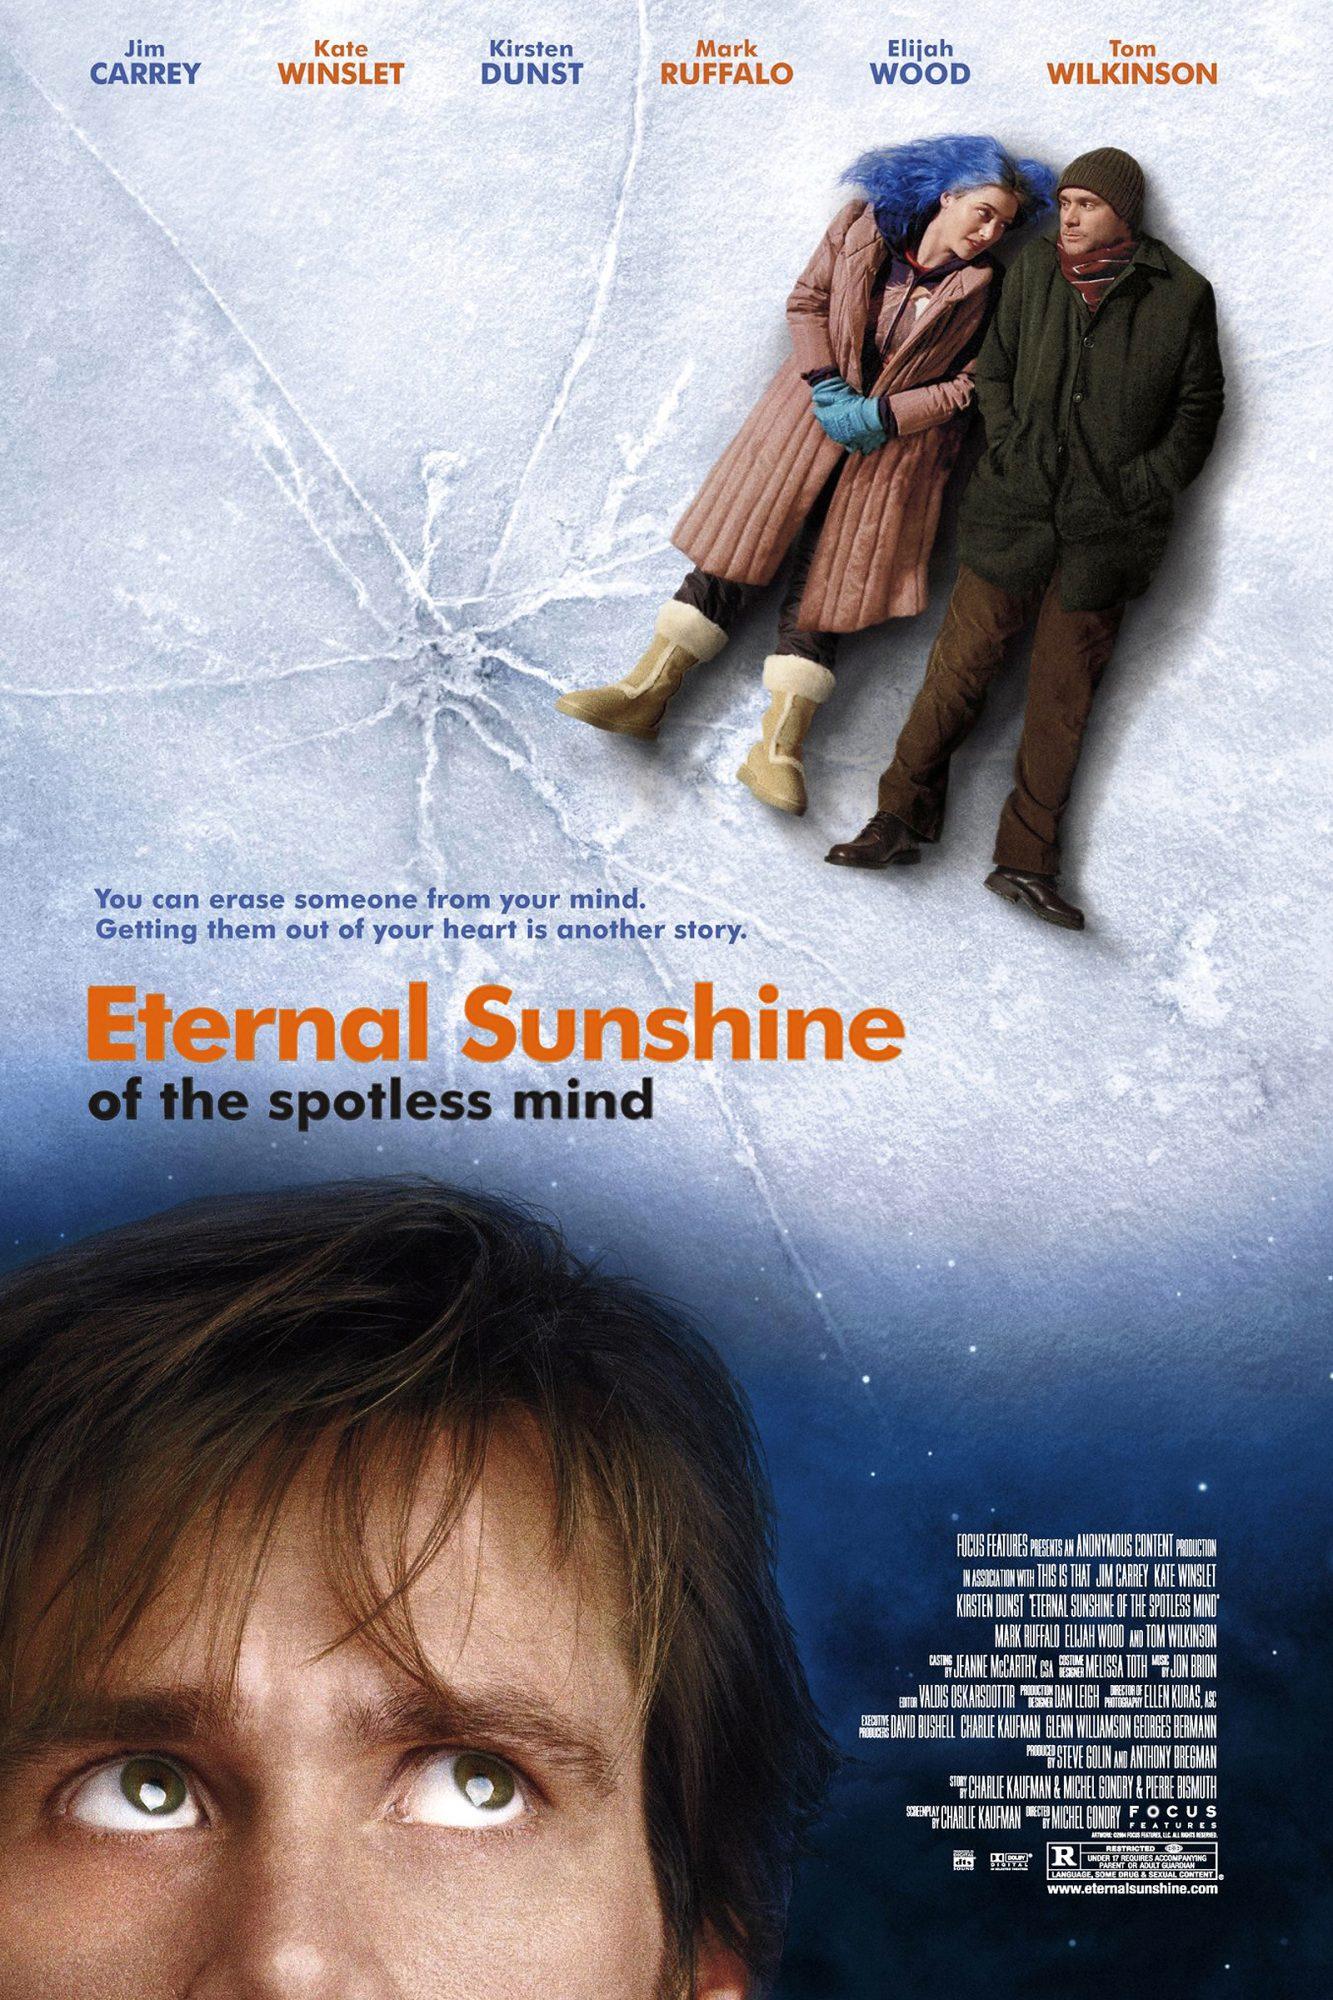 eternal-sunshine-of-the-spotless-mind-poster